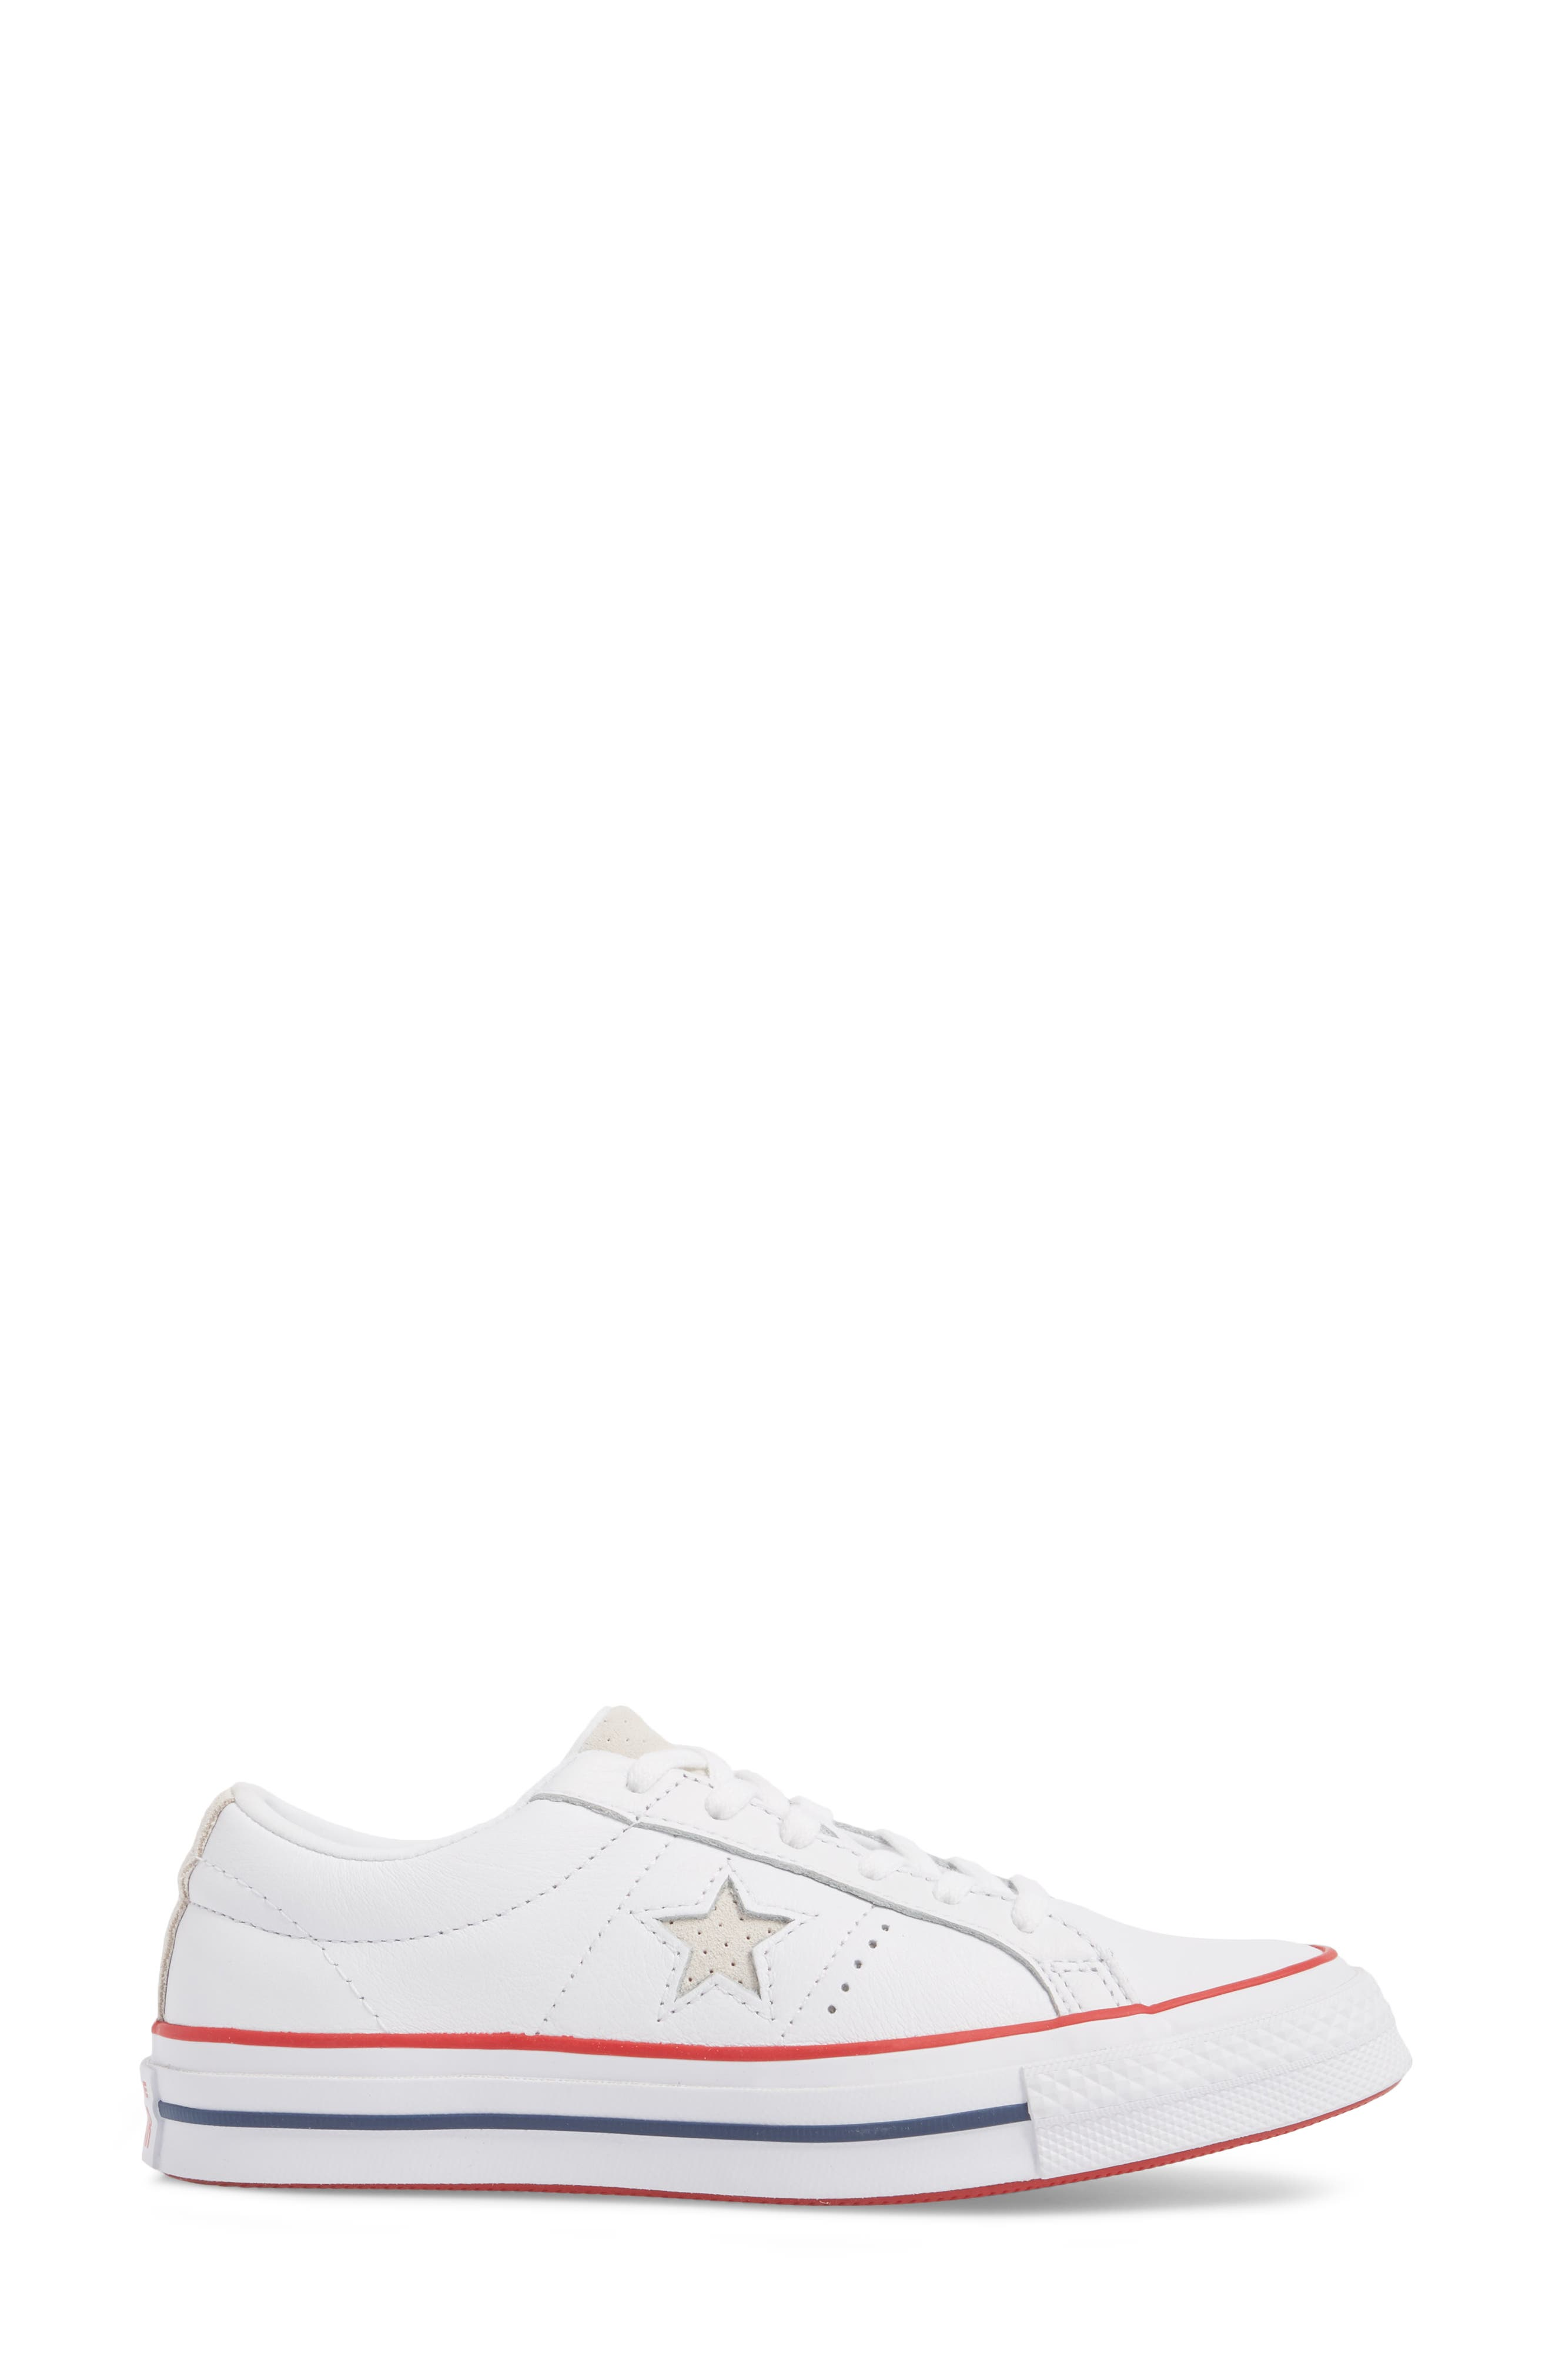 One Star Sneaker,                             Alternate thumbnail 3, color,                             White/ Gym Red